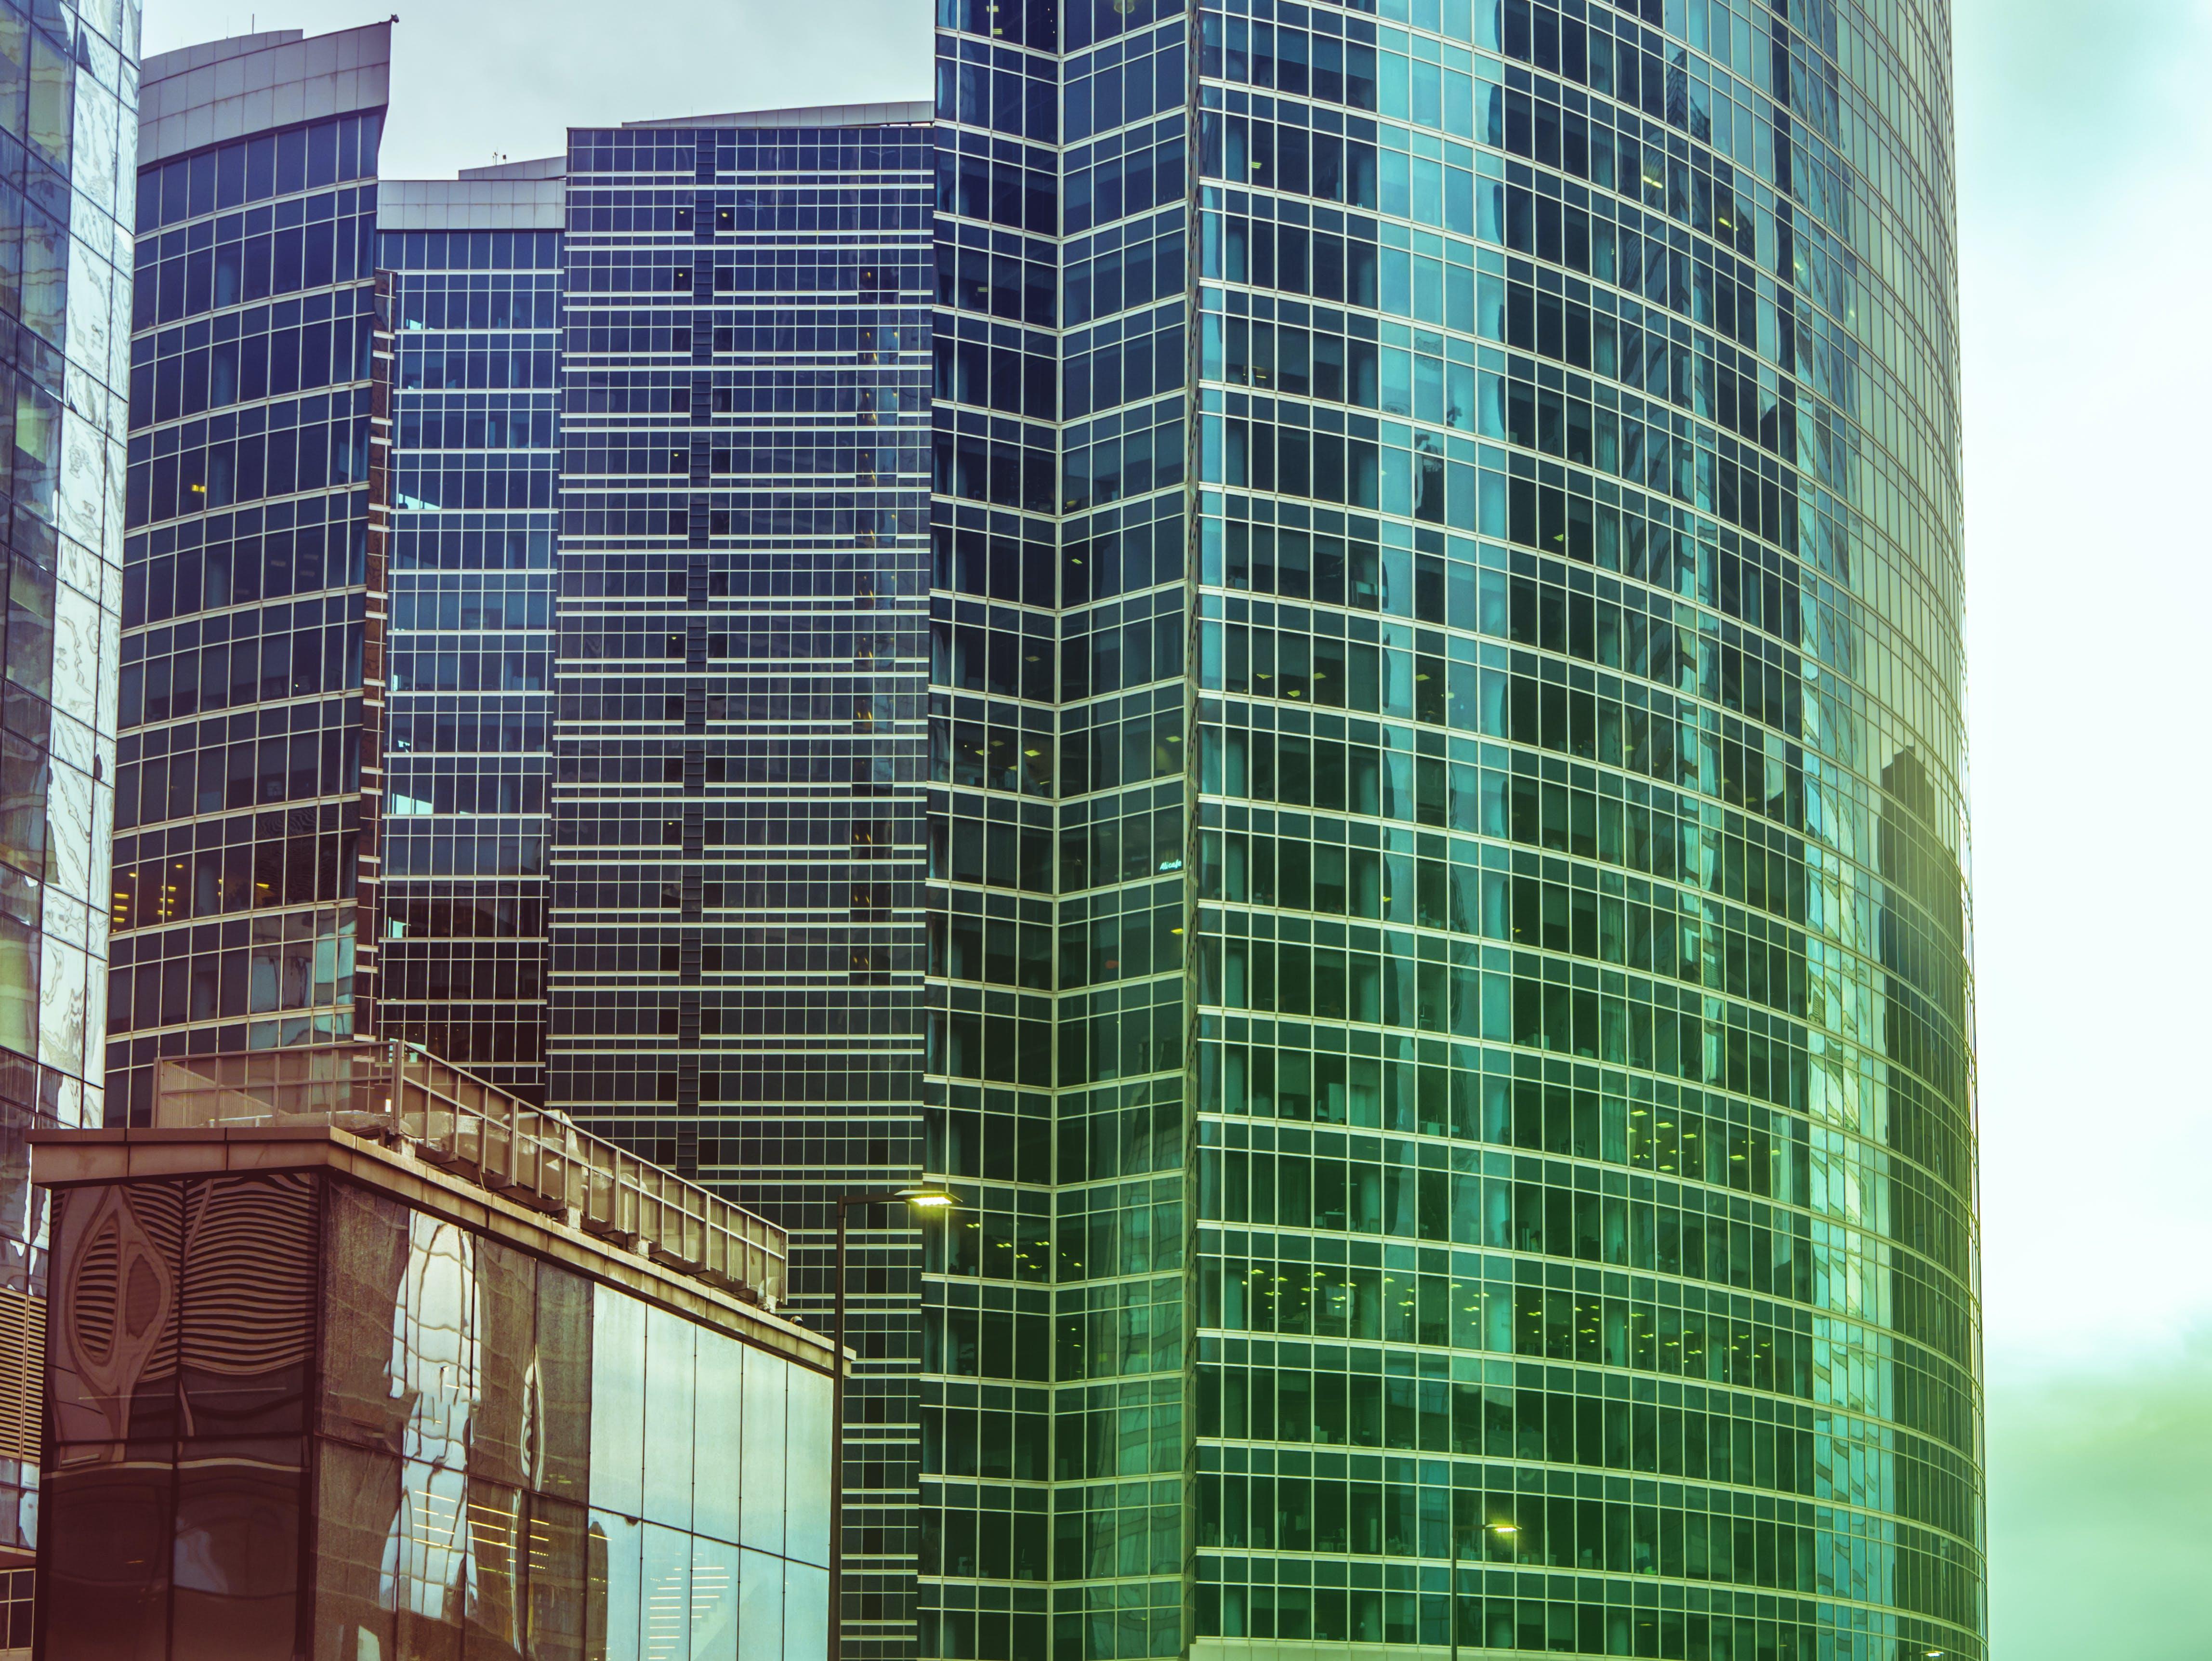 Photo of Glass Window Building